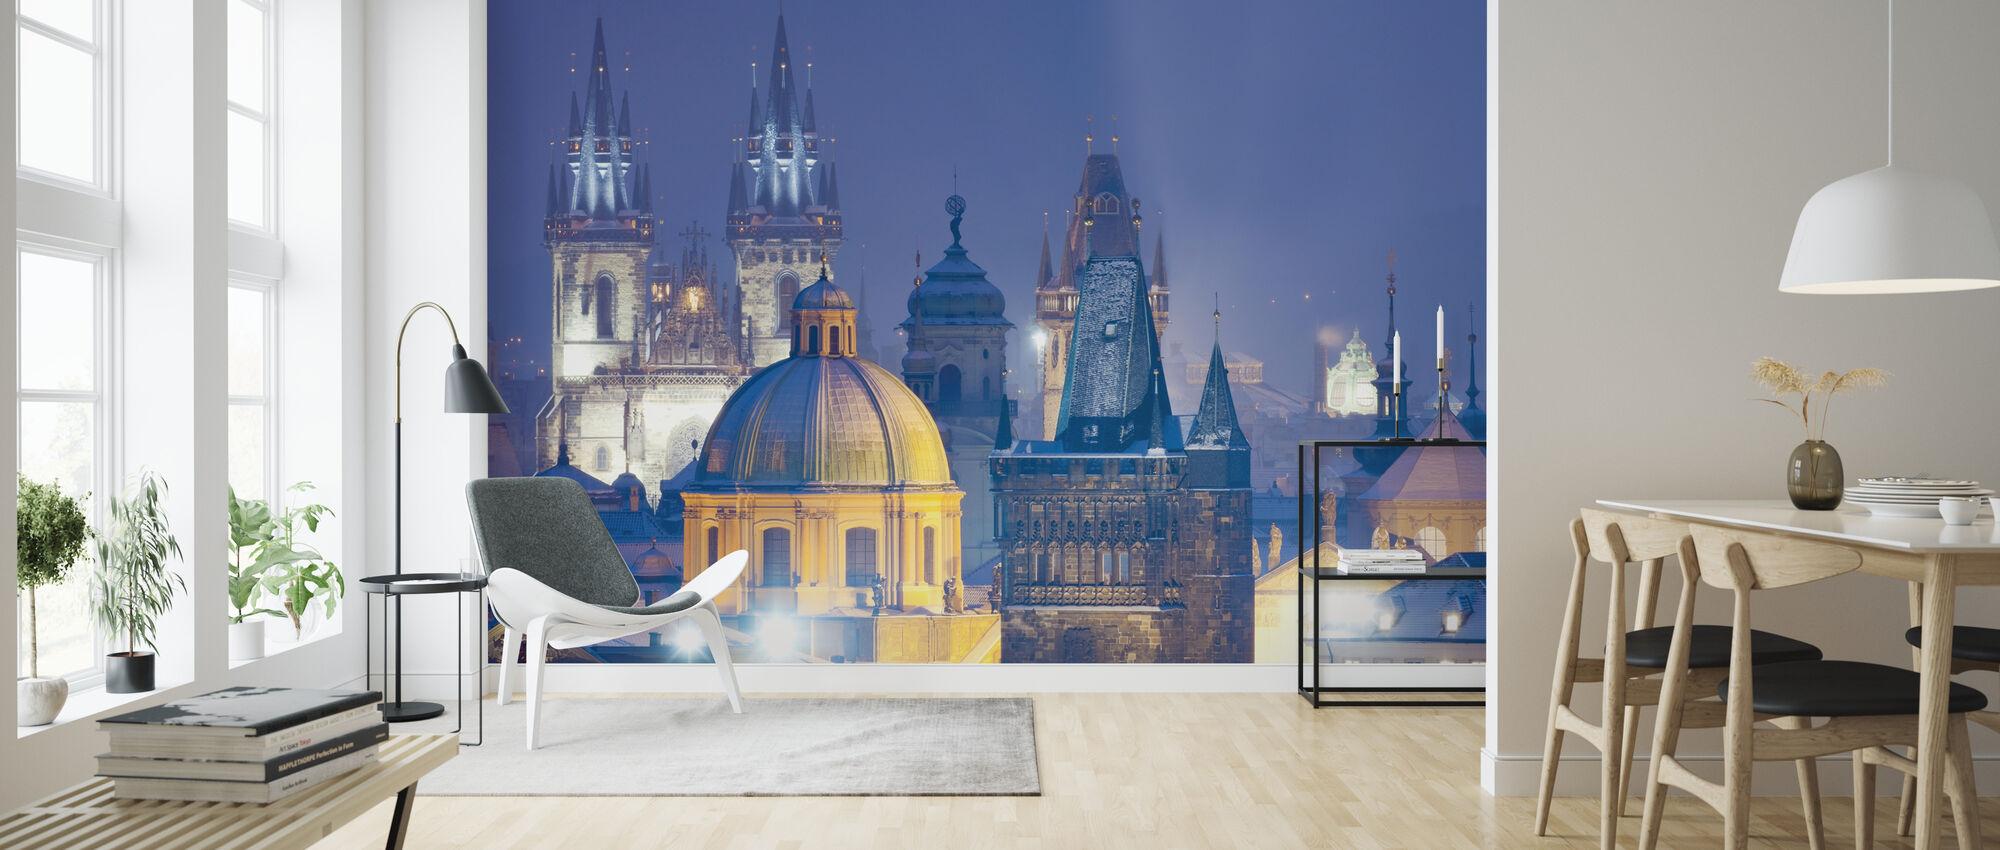 Prague by Night - Wallpaper - Living Room